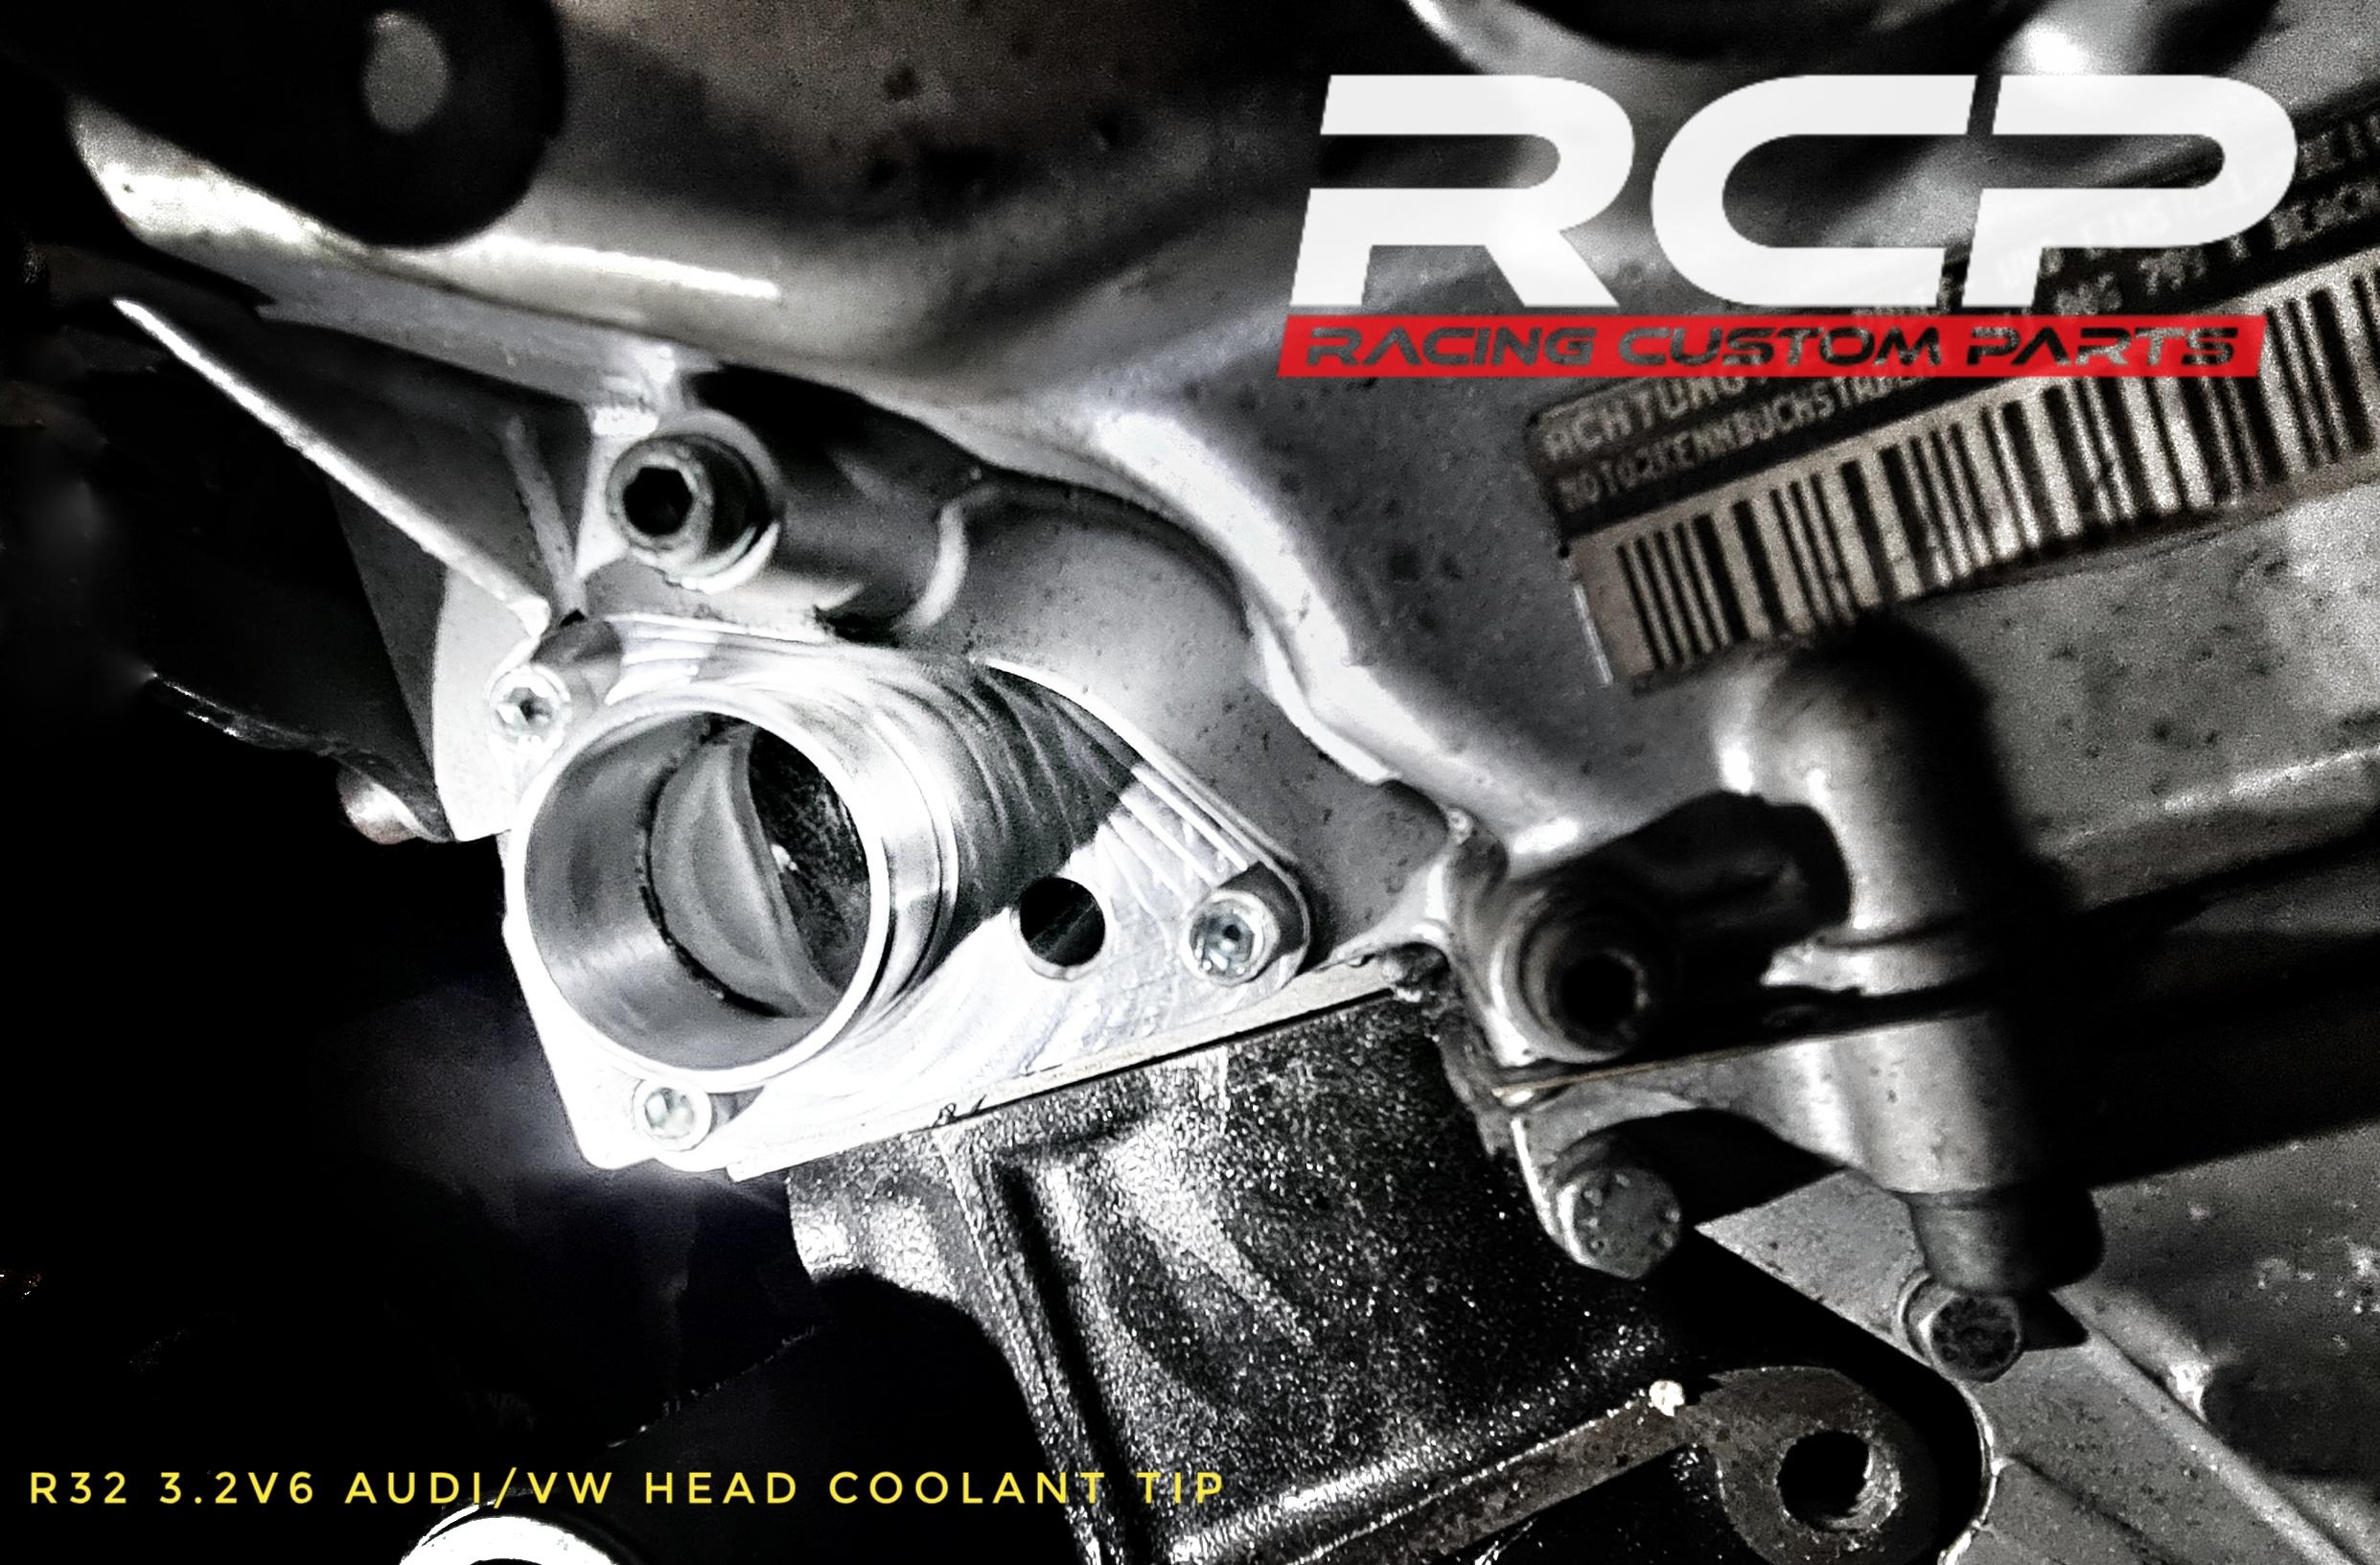 r32 3.2 v6 audi vw head coolant adapter tip turbo tuning rcp racing custom parts billet cnc